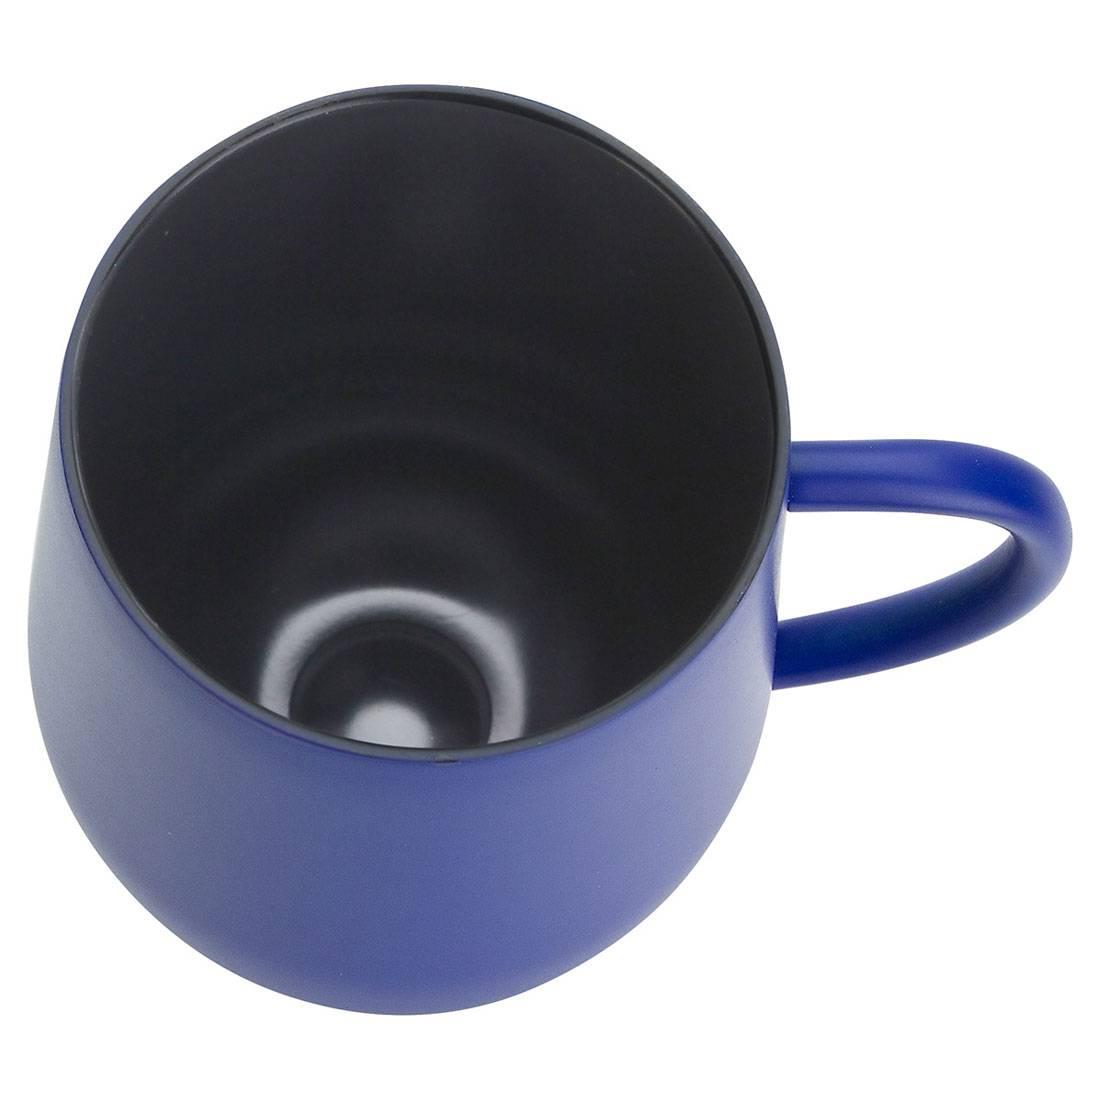 Drinkware Travel Mugs Amp Tumblers Vacuum Insulated